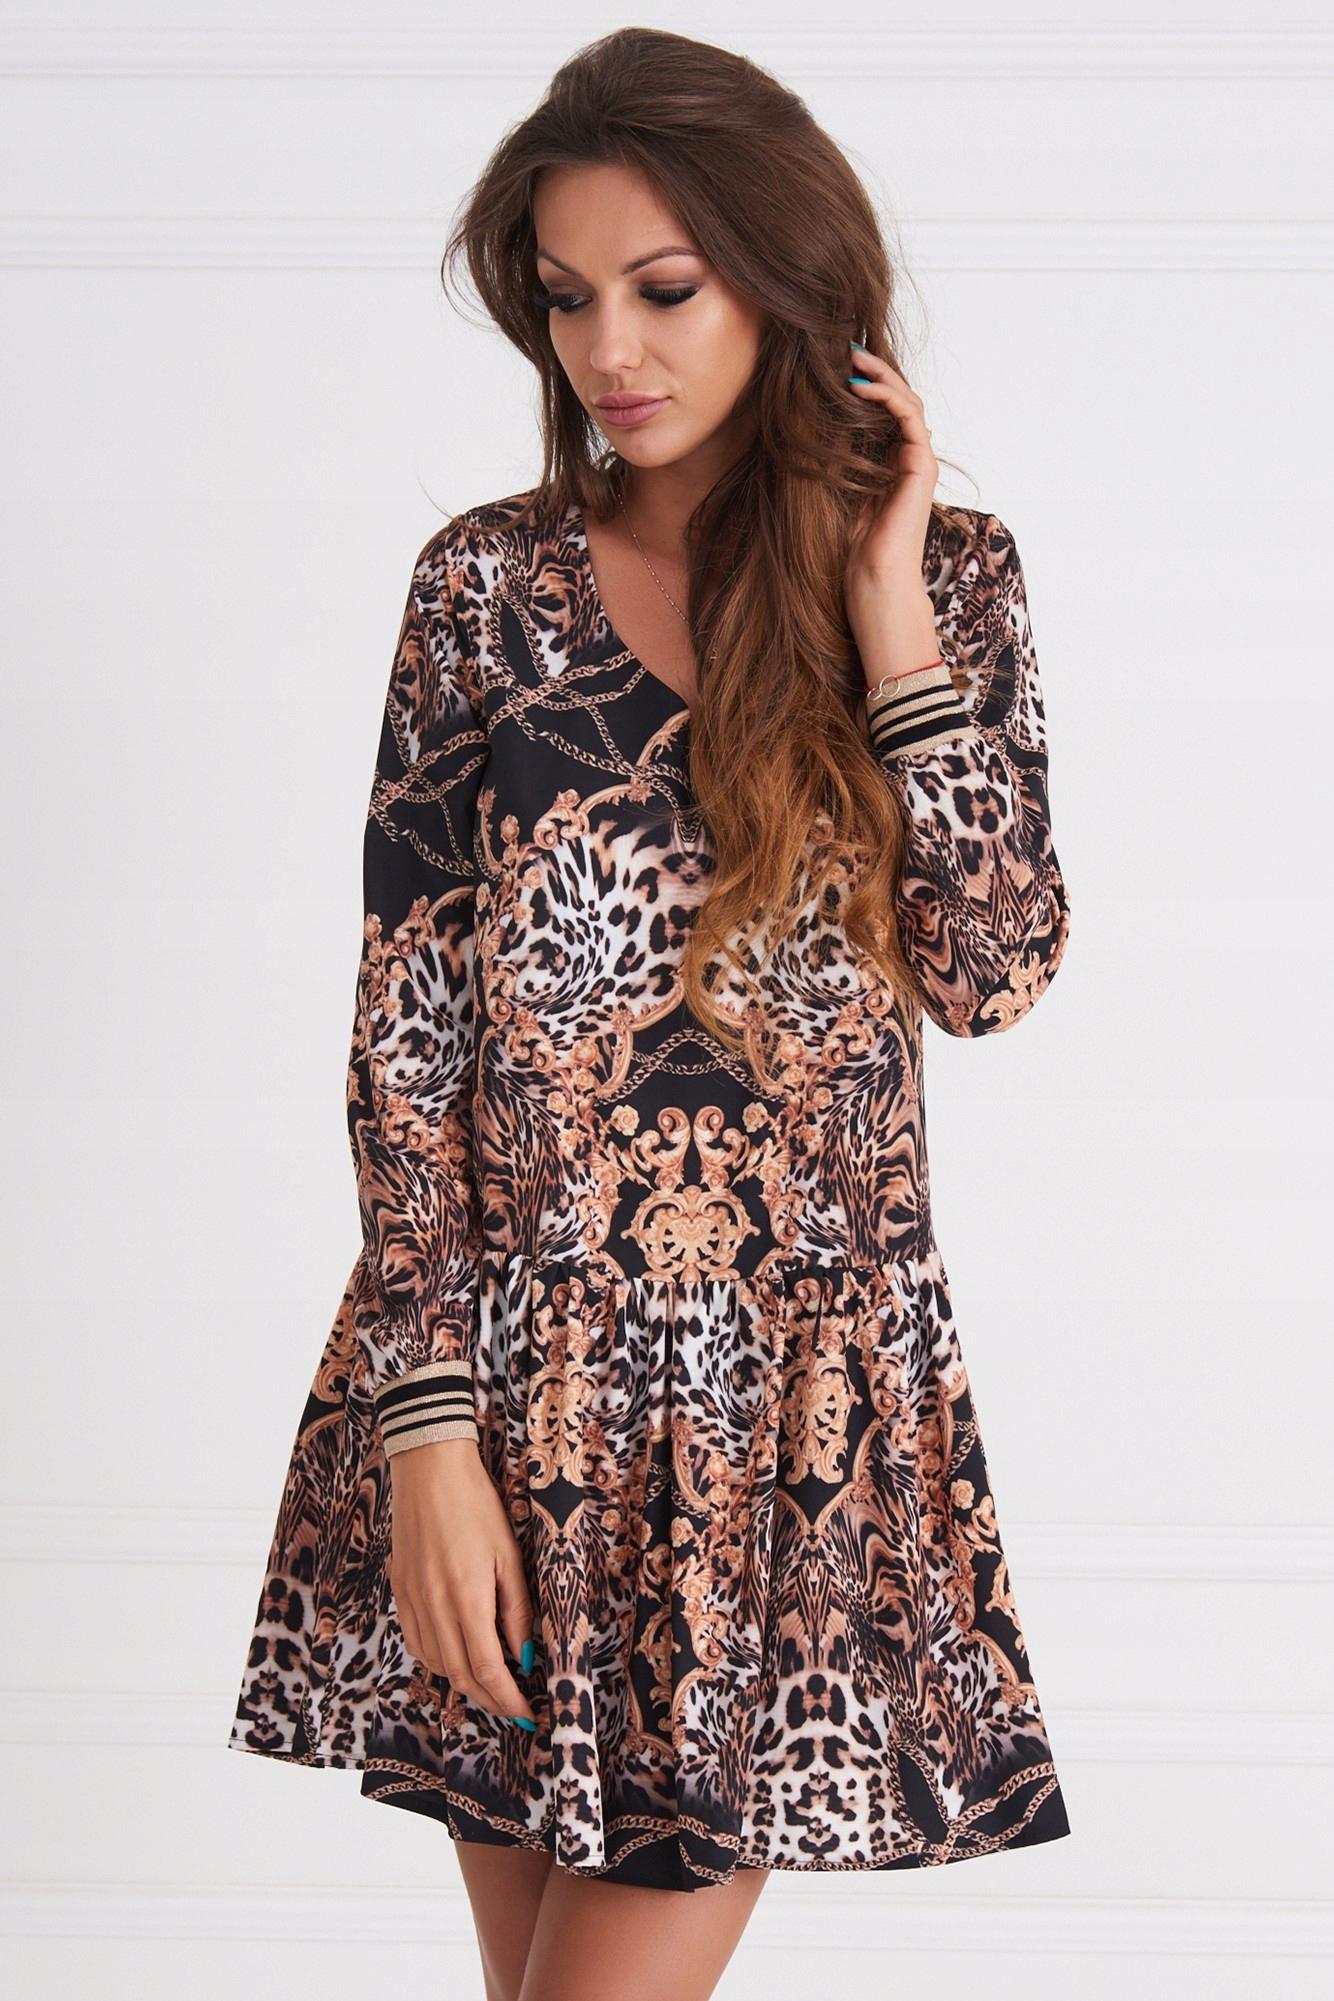 32b3b687fa Cocomore sukienka panterka czerń wzory 36 S SALE - 7642071121 ...